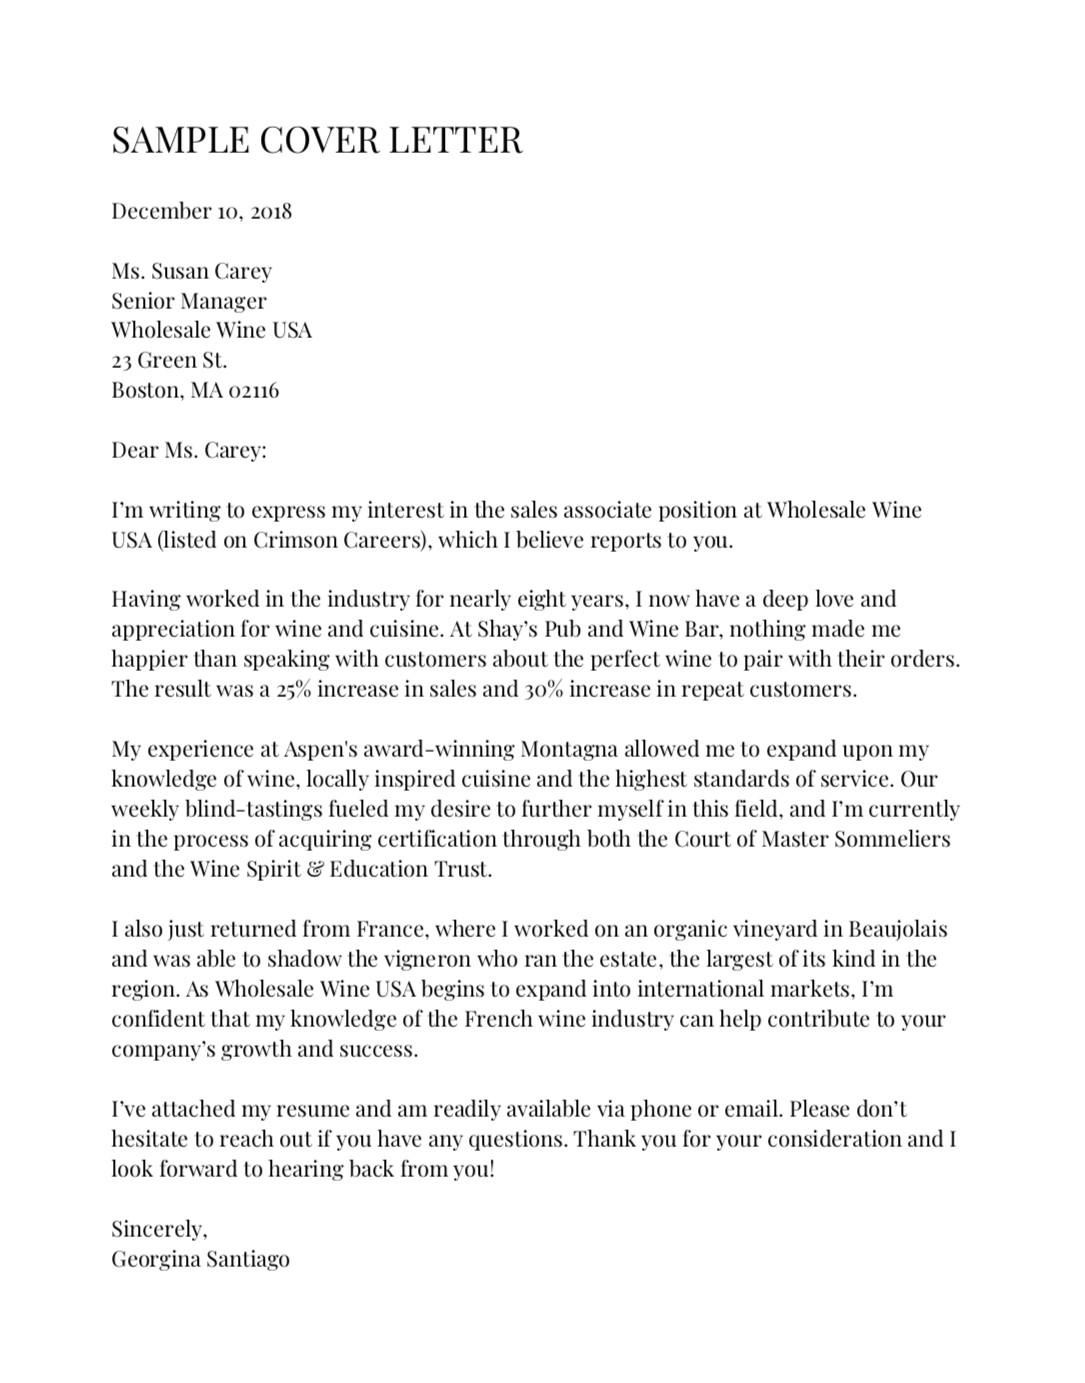 Sample Cover Letter Harvard Law School